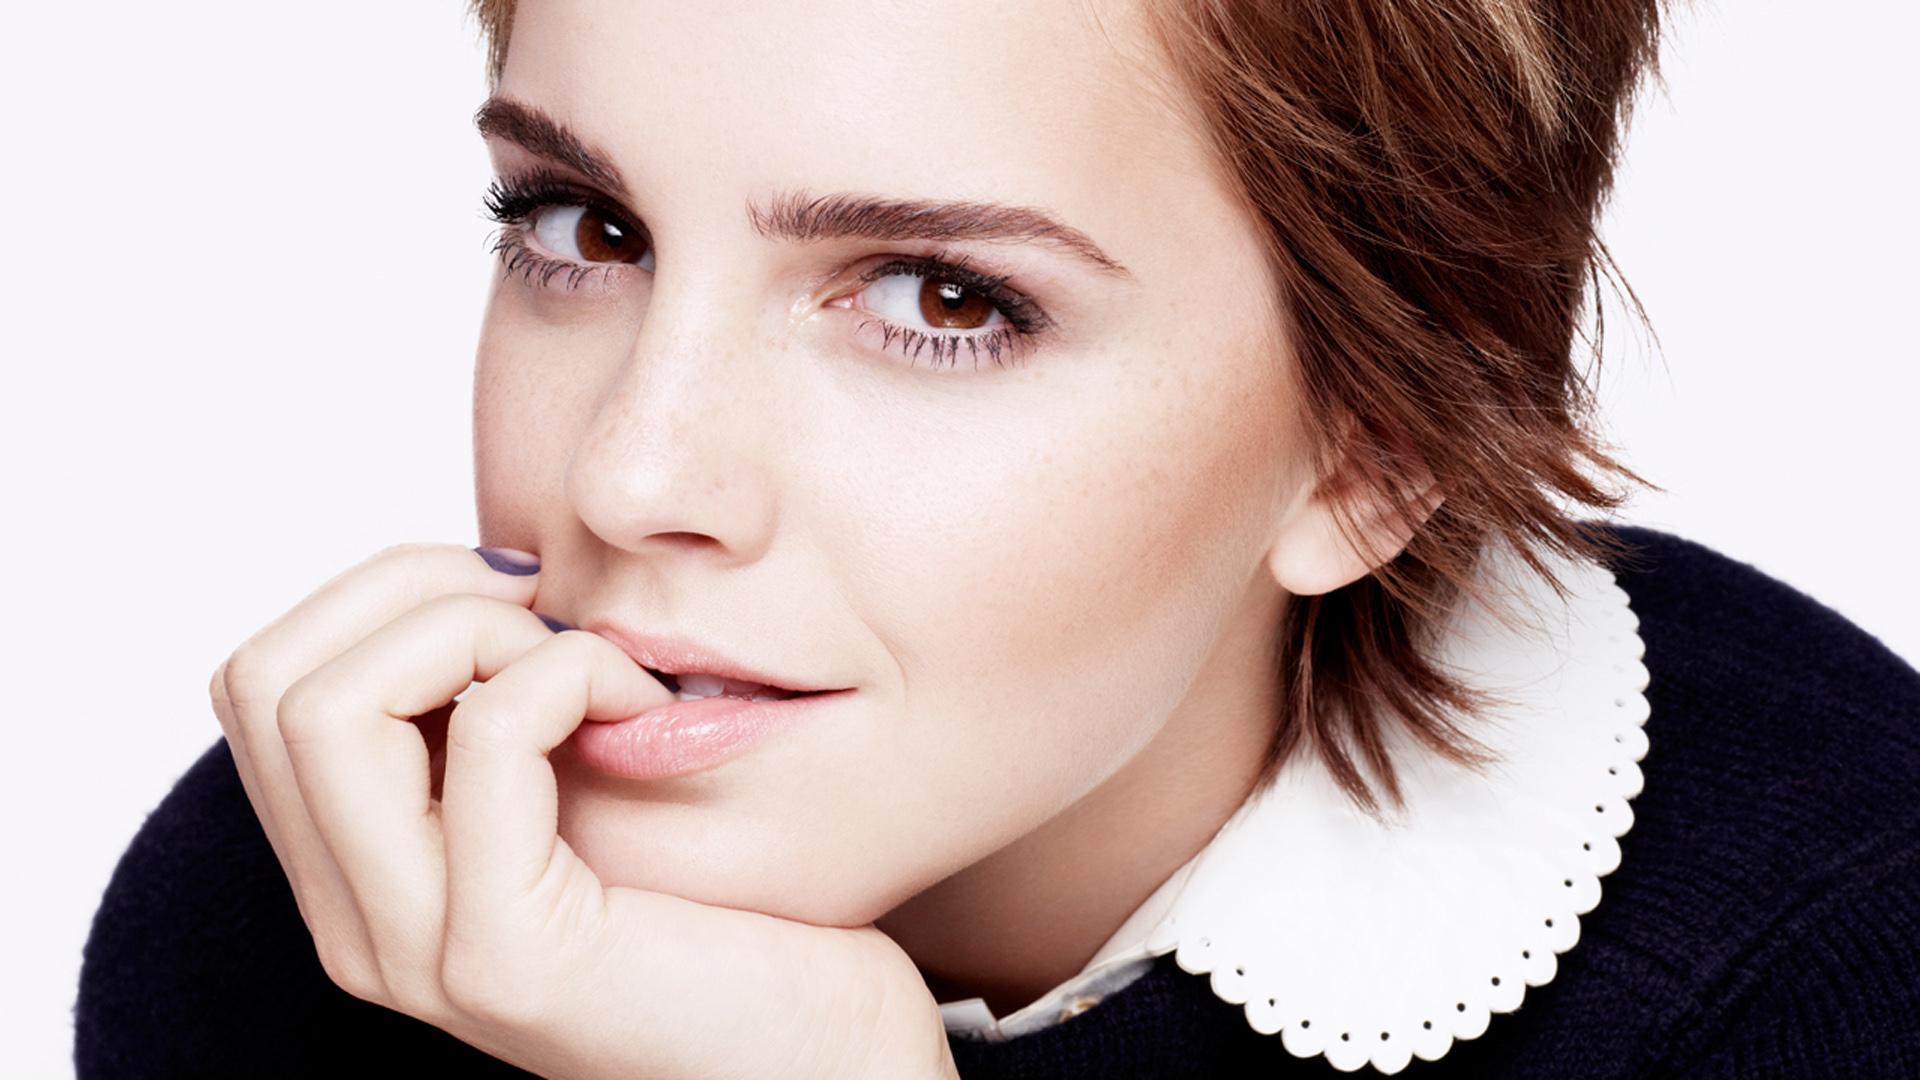 Emma Watson Wallpapers   HD HdCoolWallpapersCom 1920x1080